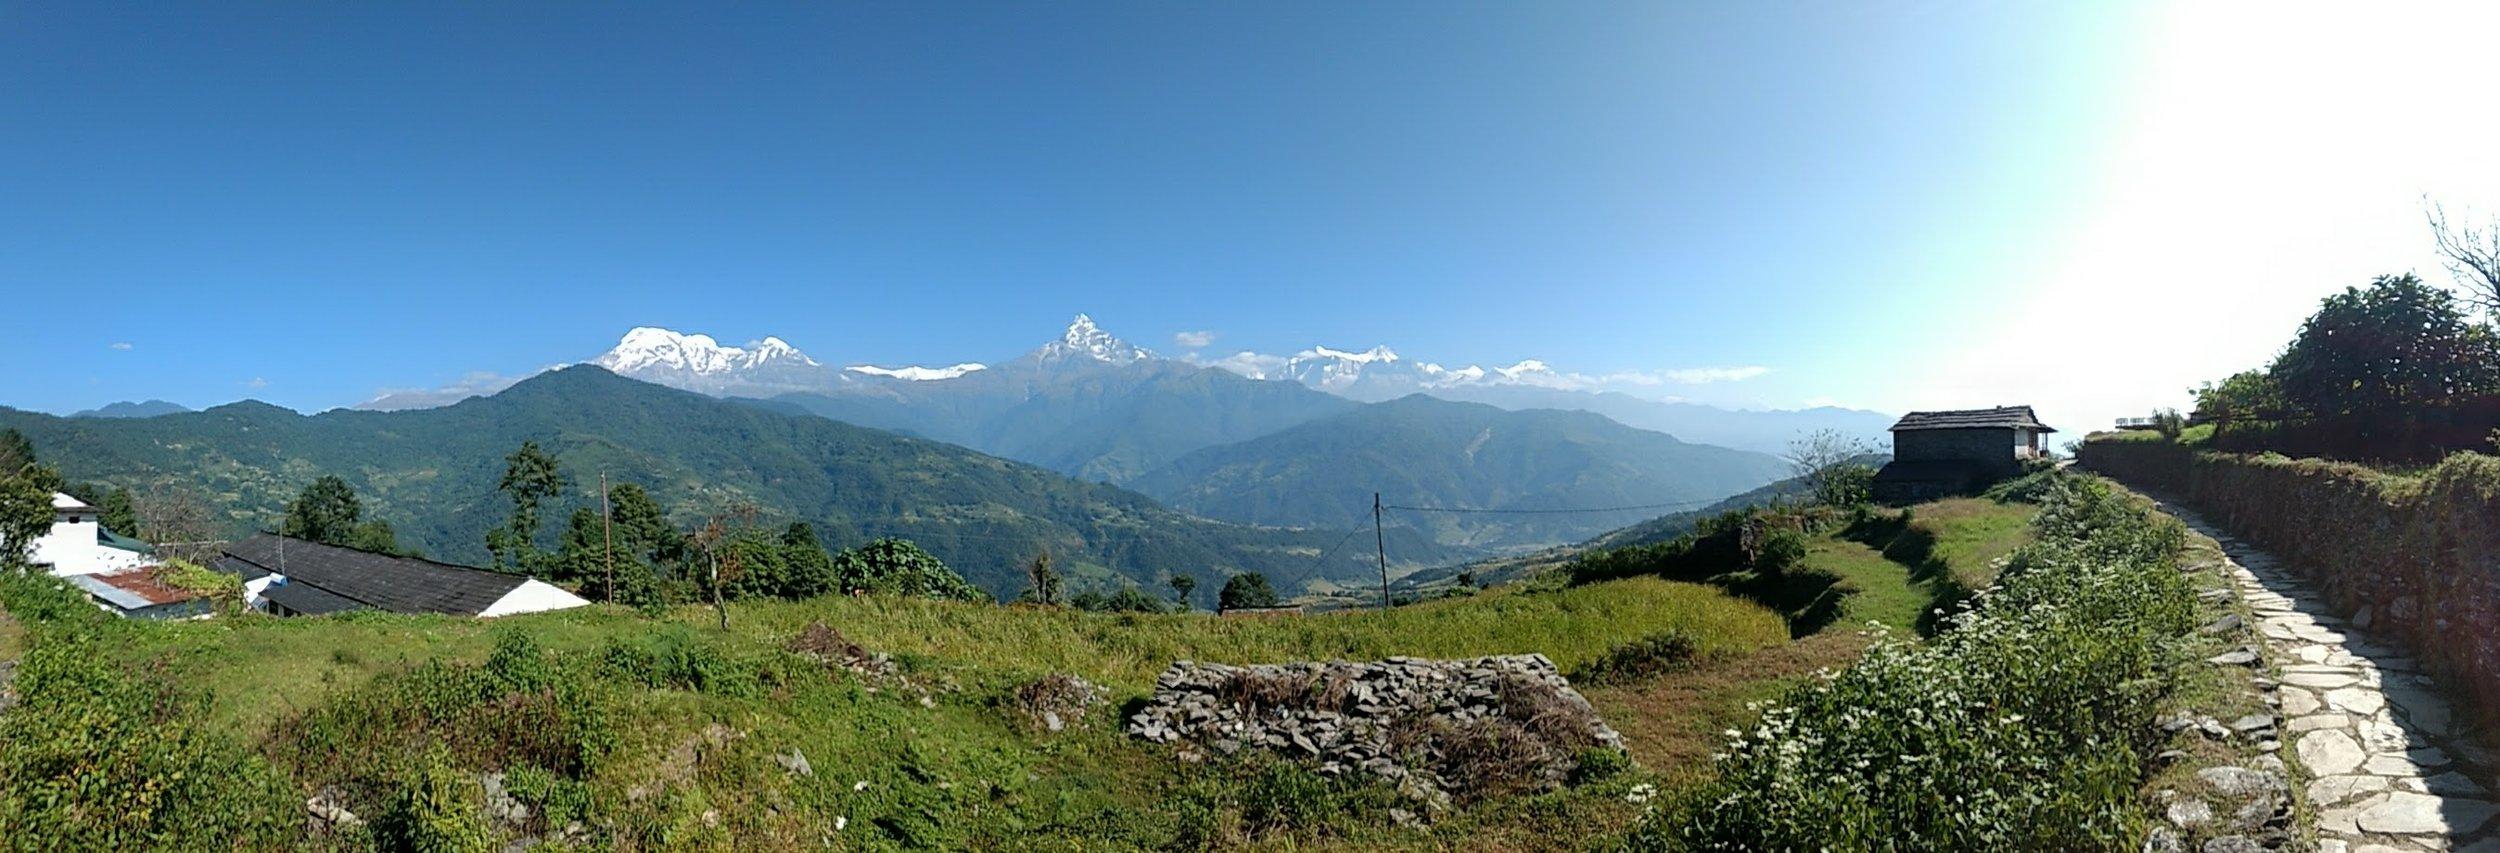 Panorama looking East towards Manaslu